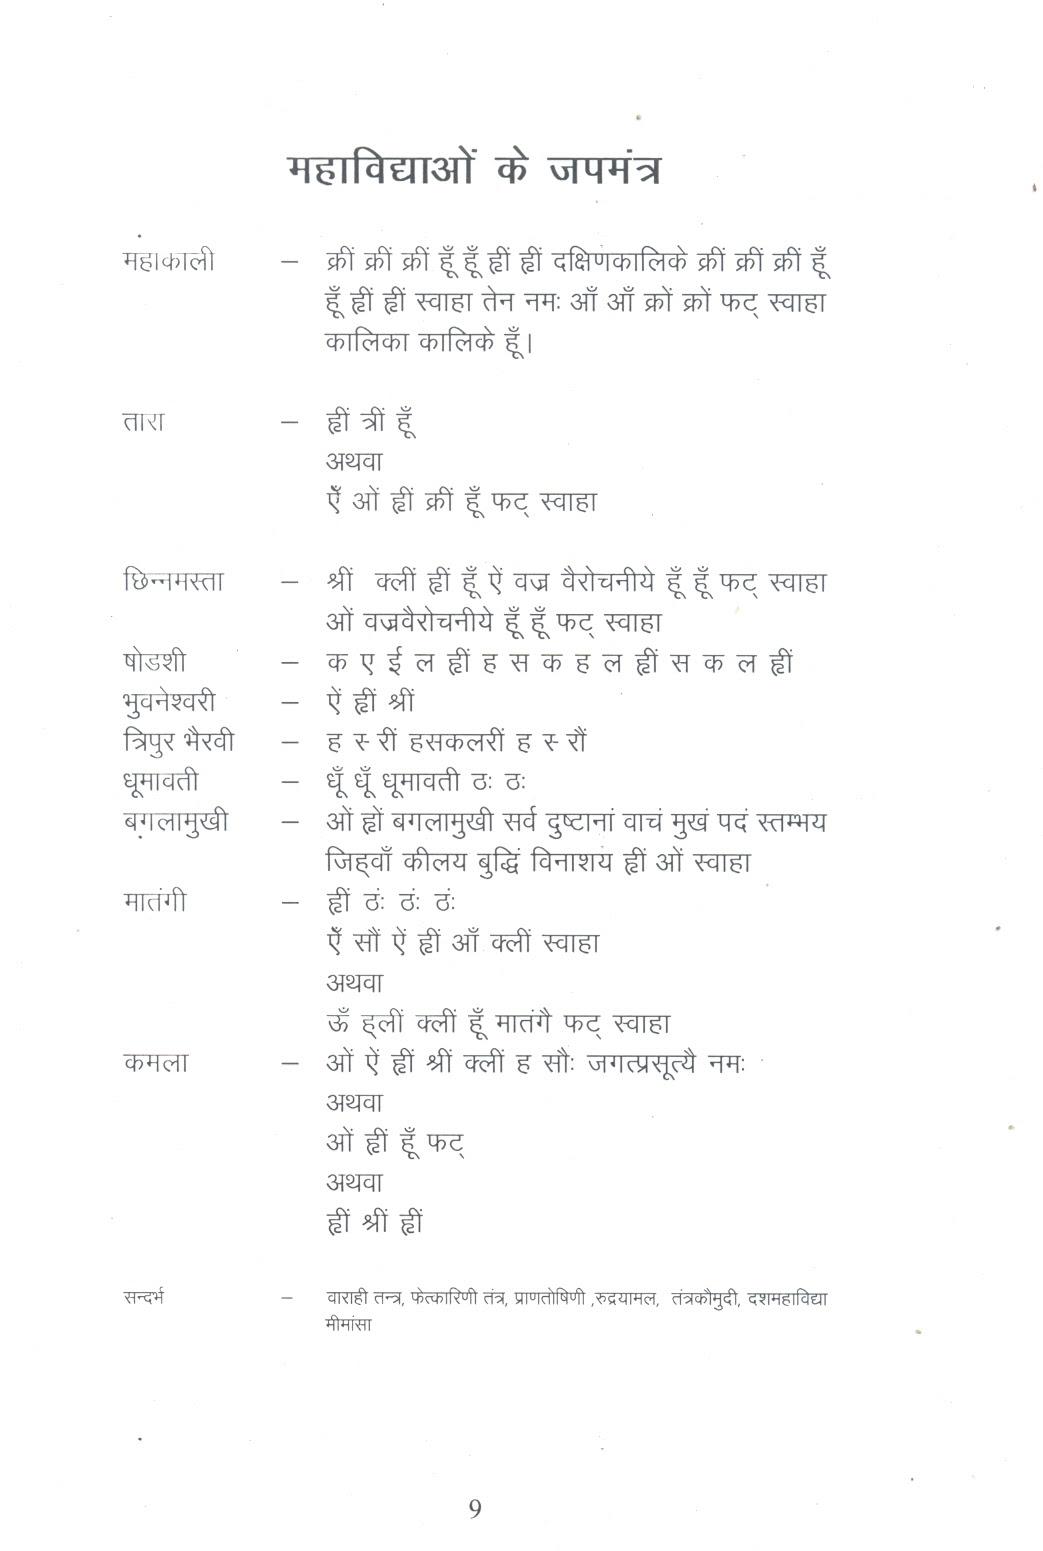 http://dushmahavidyaupaasnaa.files.wordpress.com/2011/11/mantras-in-hindi1.jpg